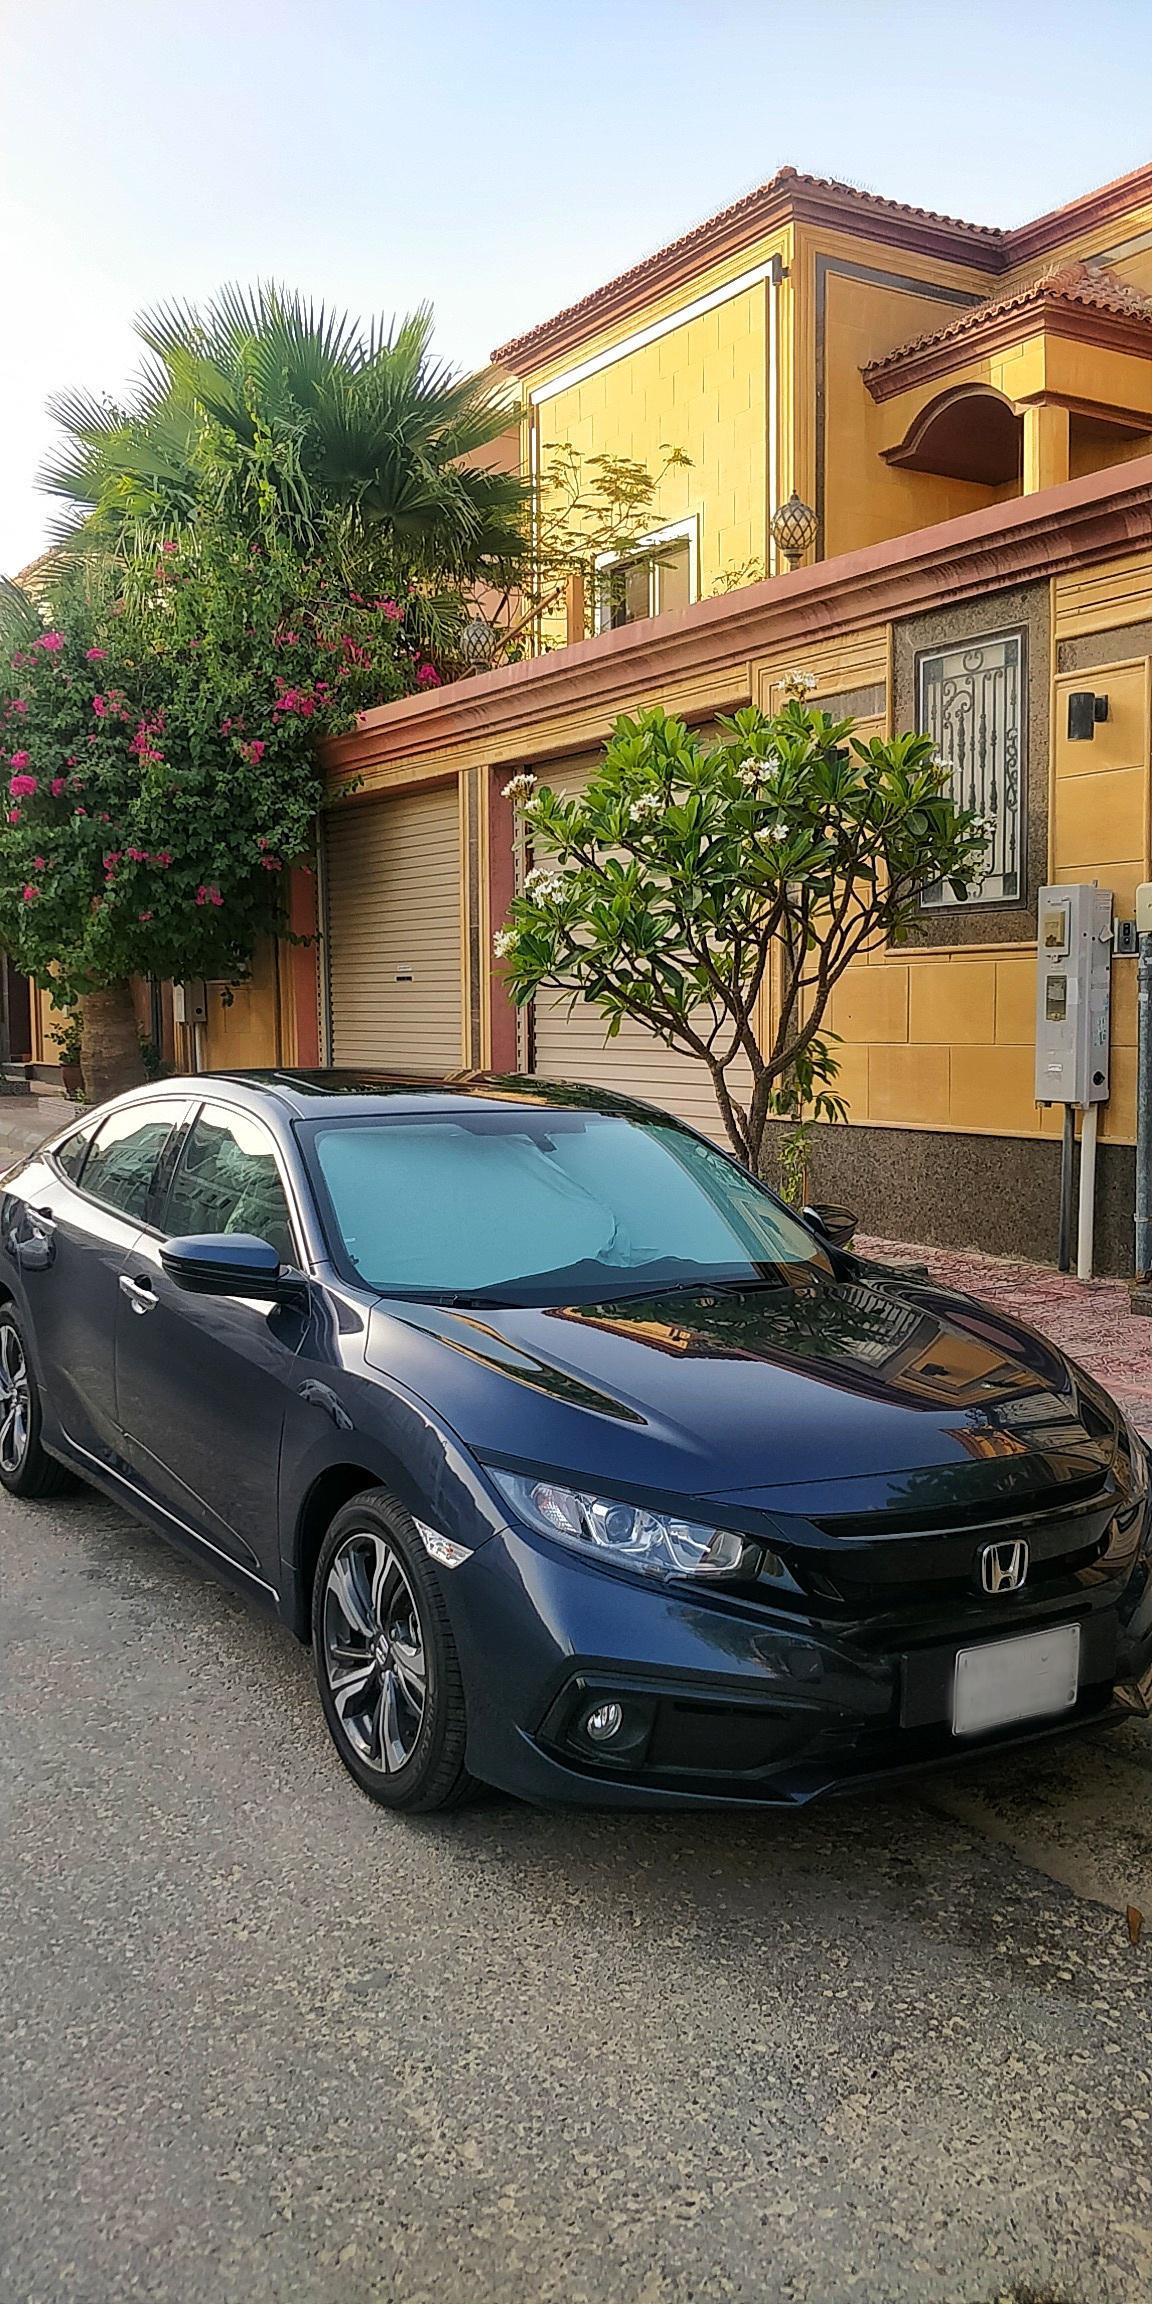 Honda Civic Reddit : honda, civic, reddit, Joined, Civic, Sedan, First, Honda, After, Chevrolet.